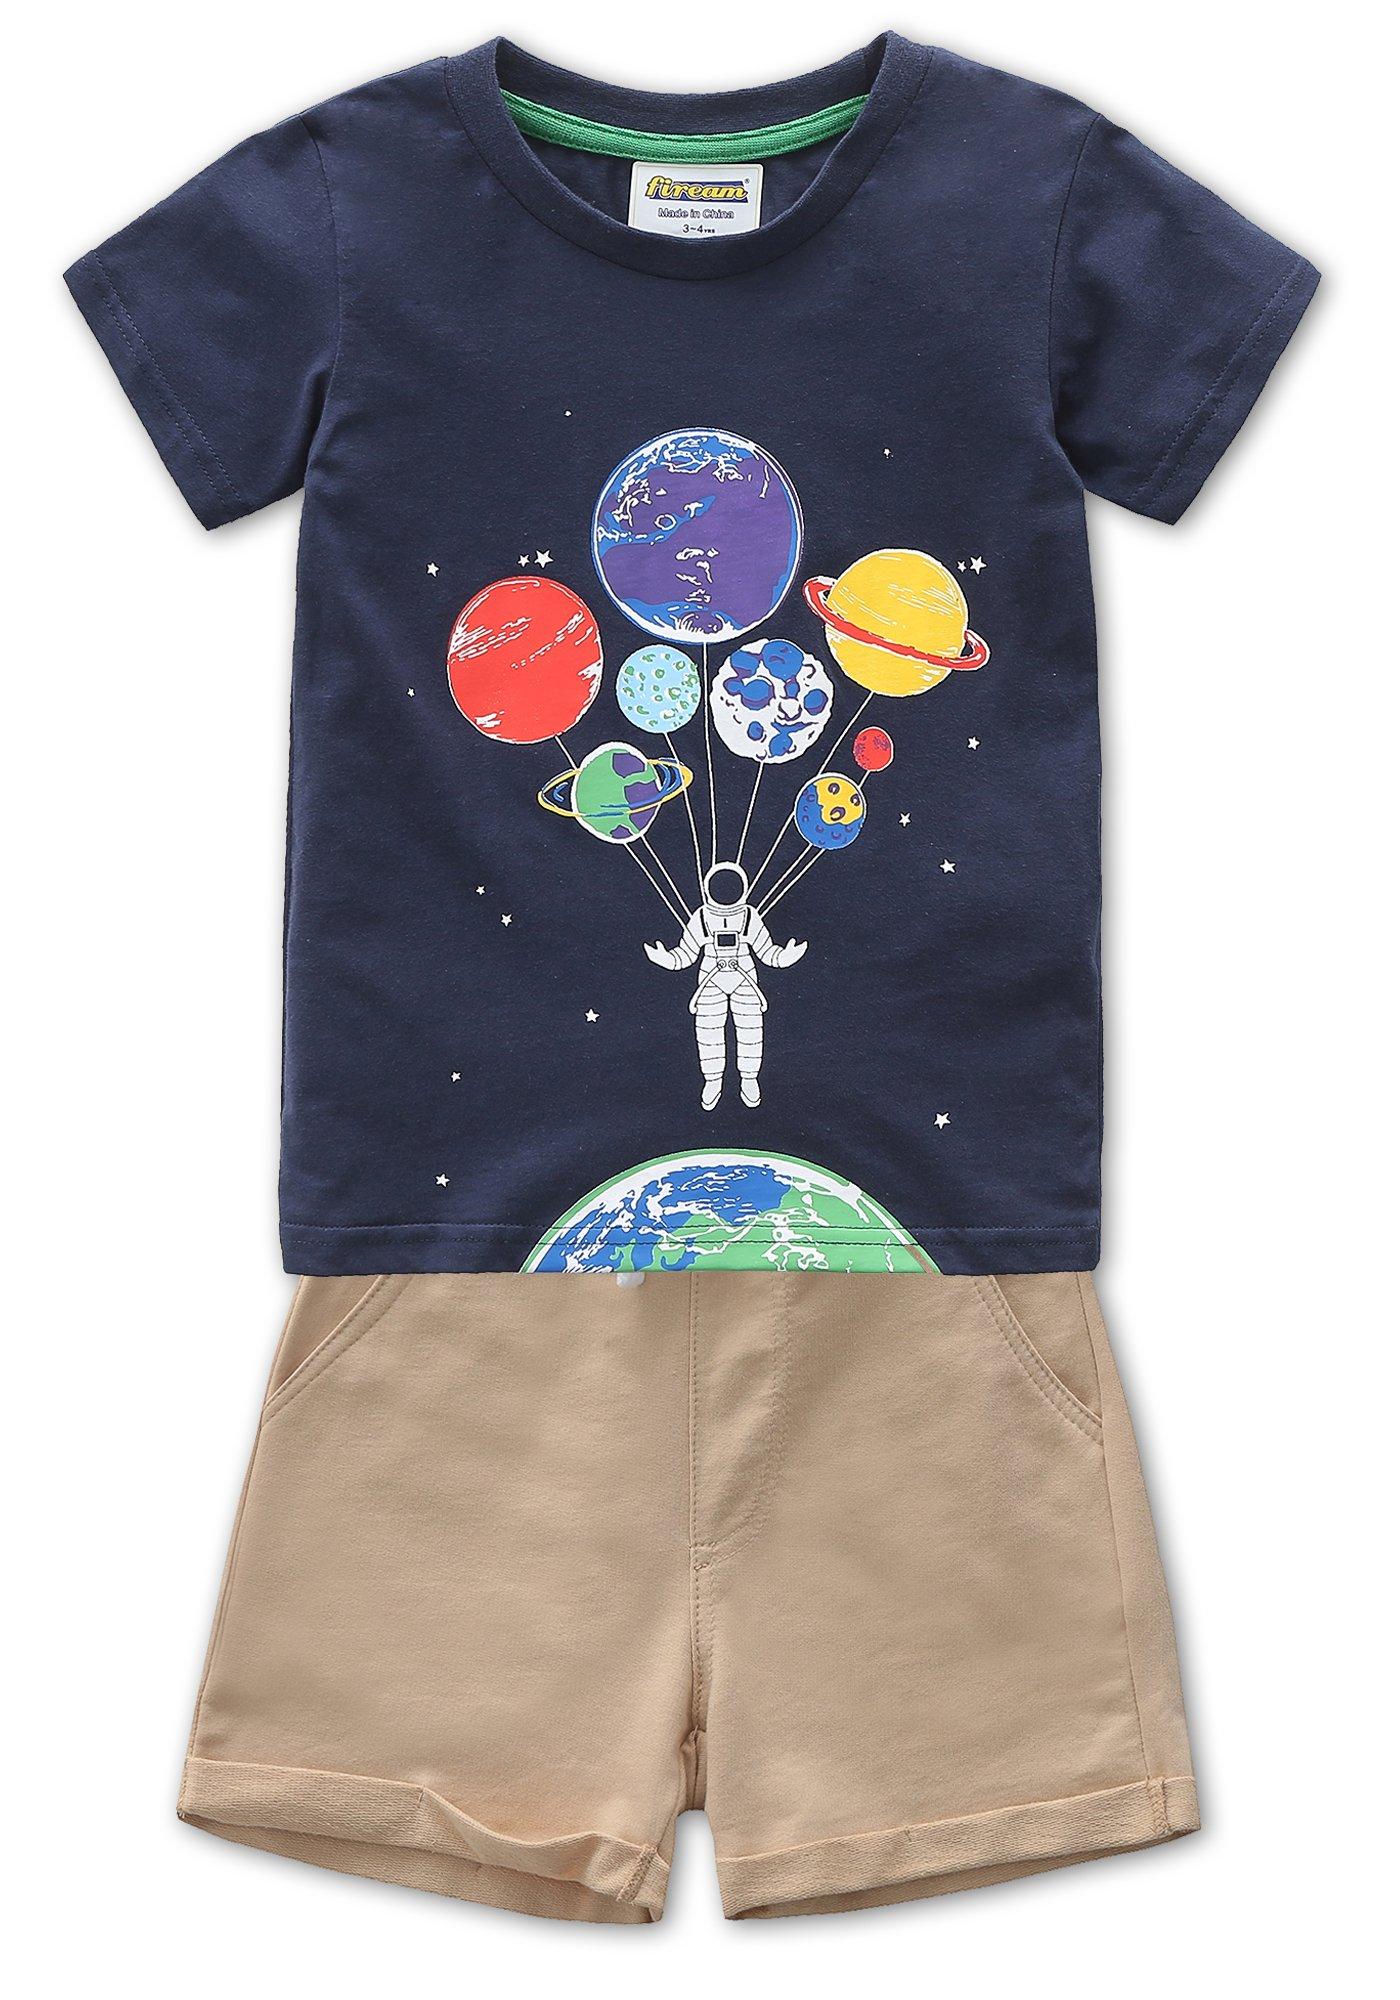 Fiream Boy's Cotton Shortsleeve Sets Shortsleeve Space Pattern Summer T-Shirts and Shorts 2 pcs Clothing Sets (18023,18M/1-2YRS)